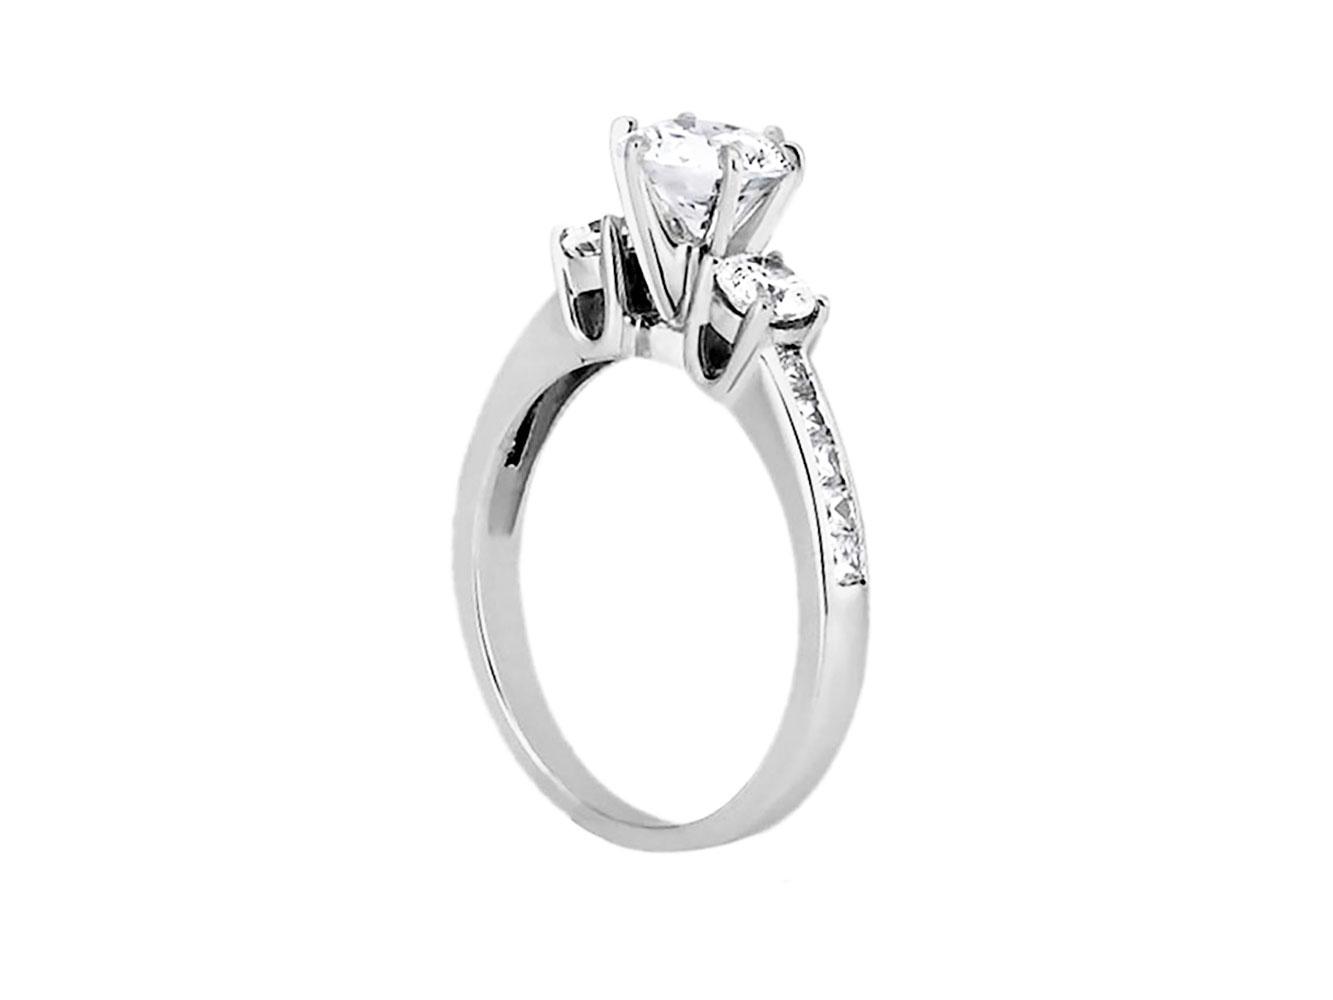 1-10-Quilates-Redondo-Princesa-Anillo-de-Compromiso-Diamante-Corte-10-Oro-Kl-I1 miniatura 8